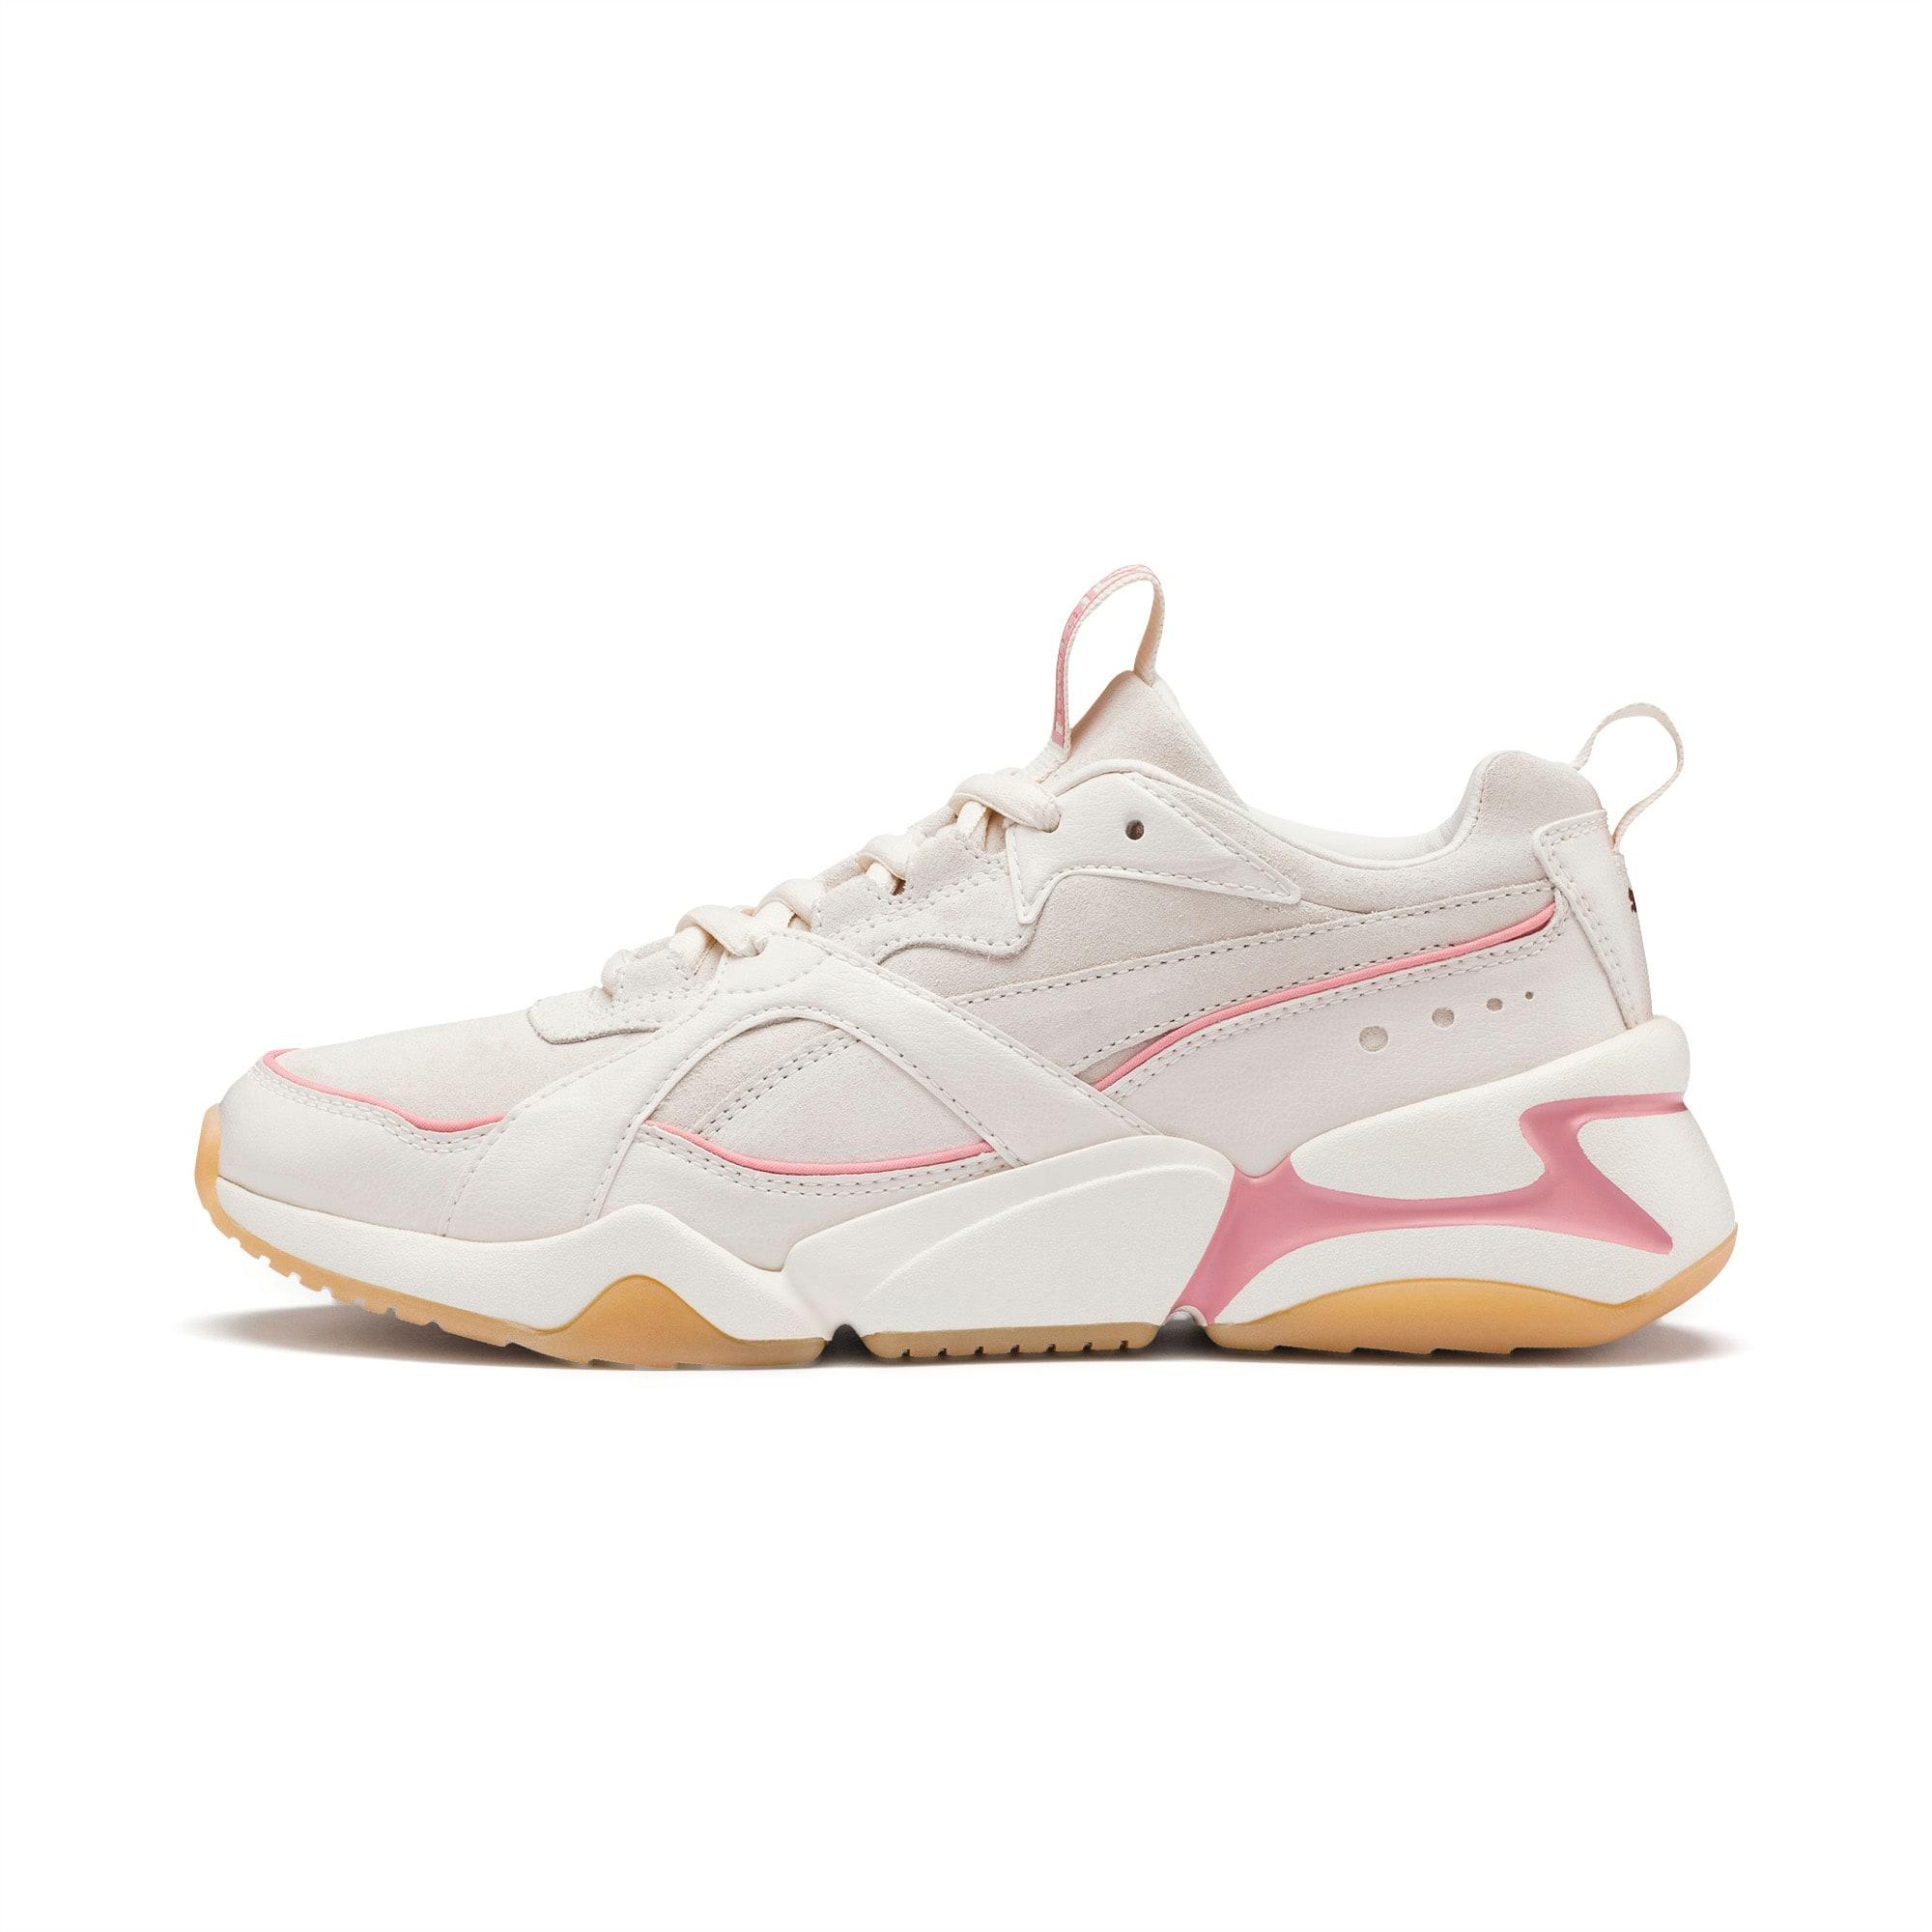 Periodo perioperatorio Desfavorable solitario  Nova 2 Suede Women's Trainers | Pastel Parchment-Whisp White | PUMA  Sneakers | PUMA